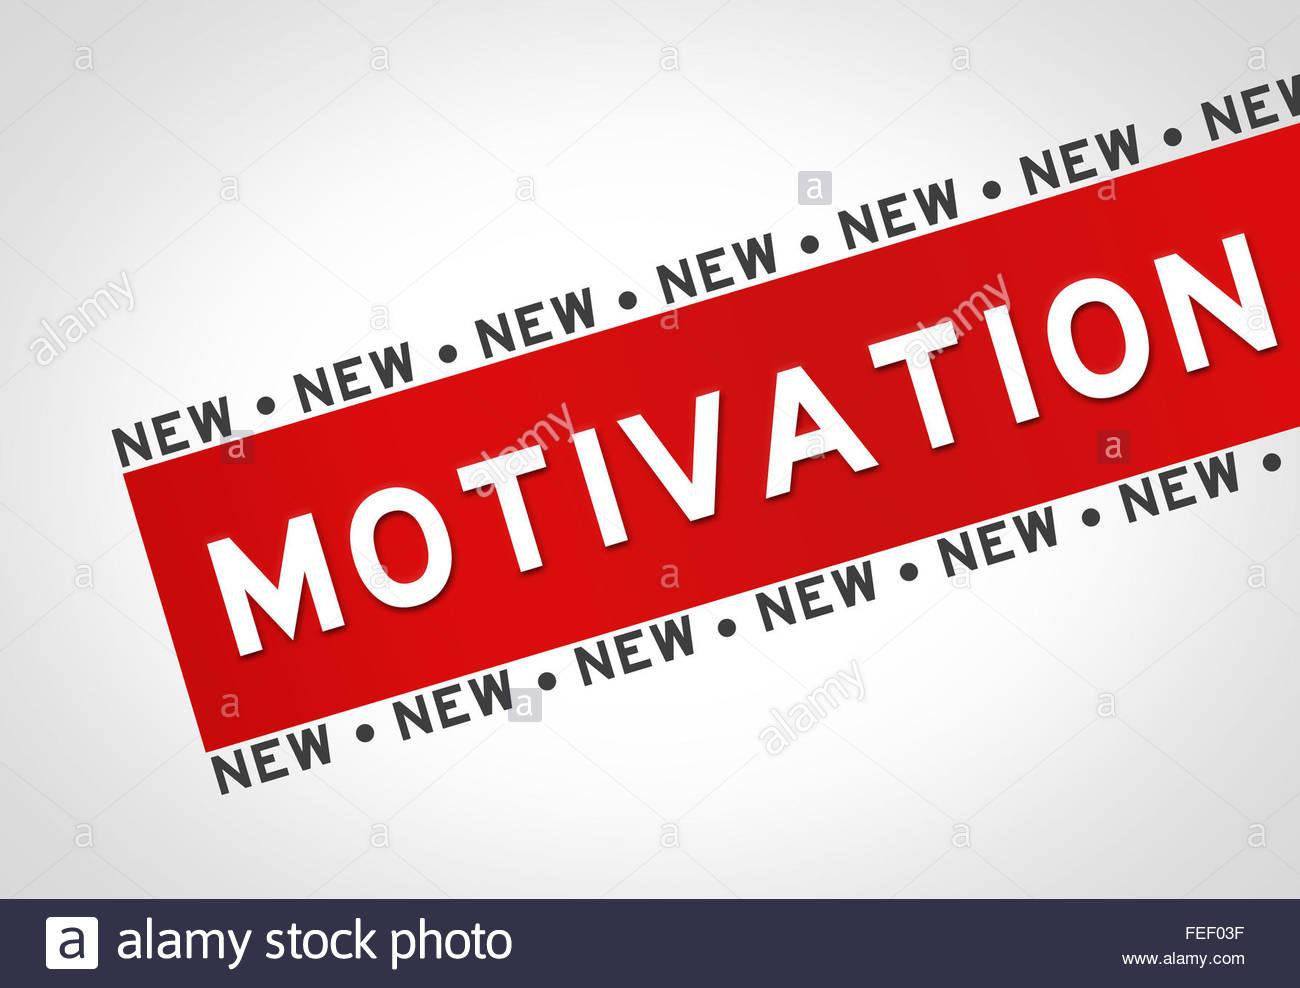 Motivation - concept illustration - Stock Image